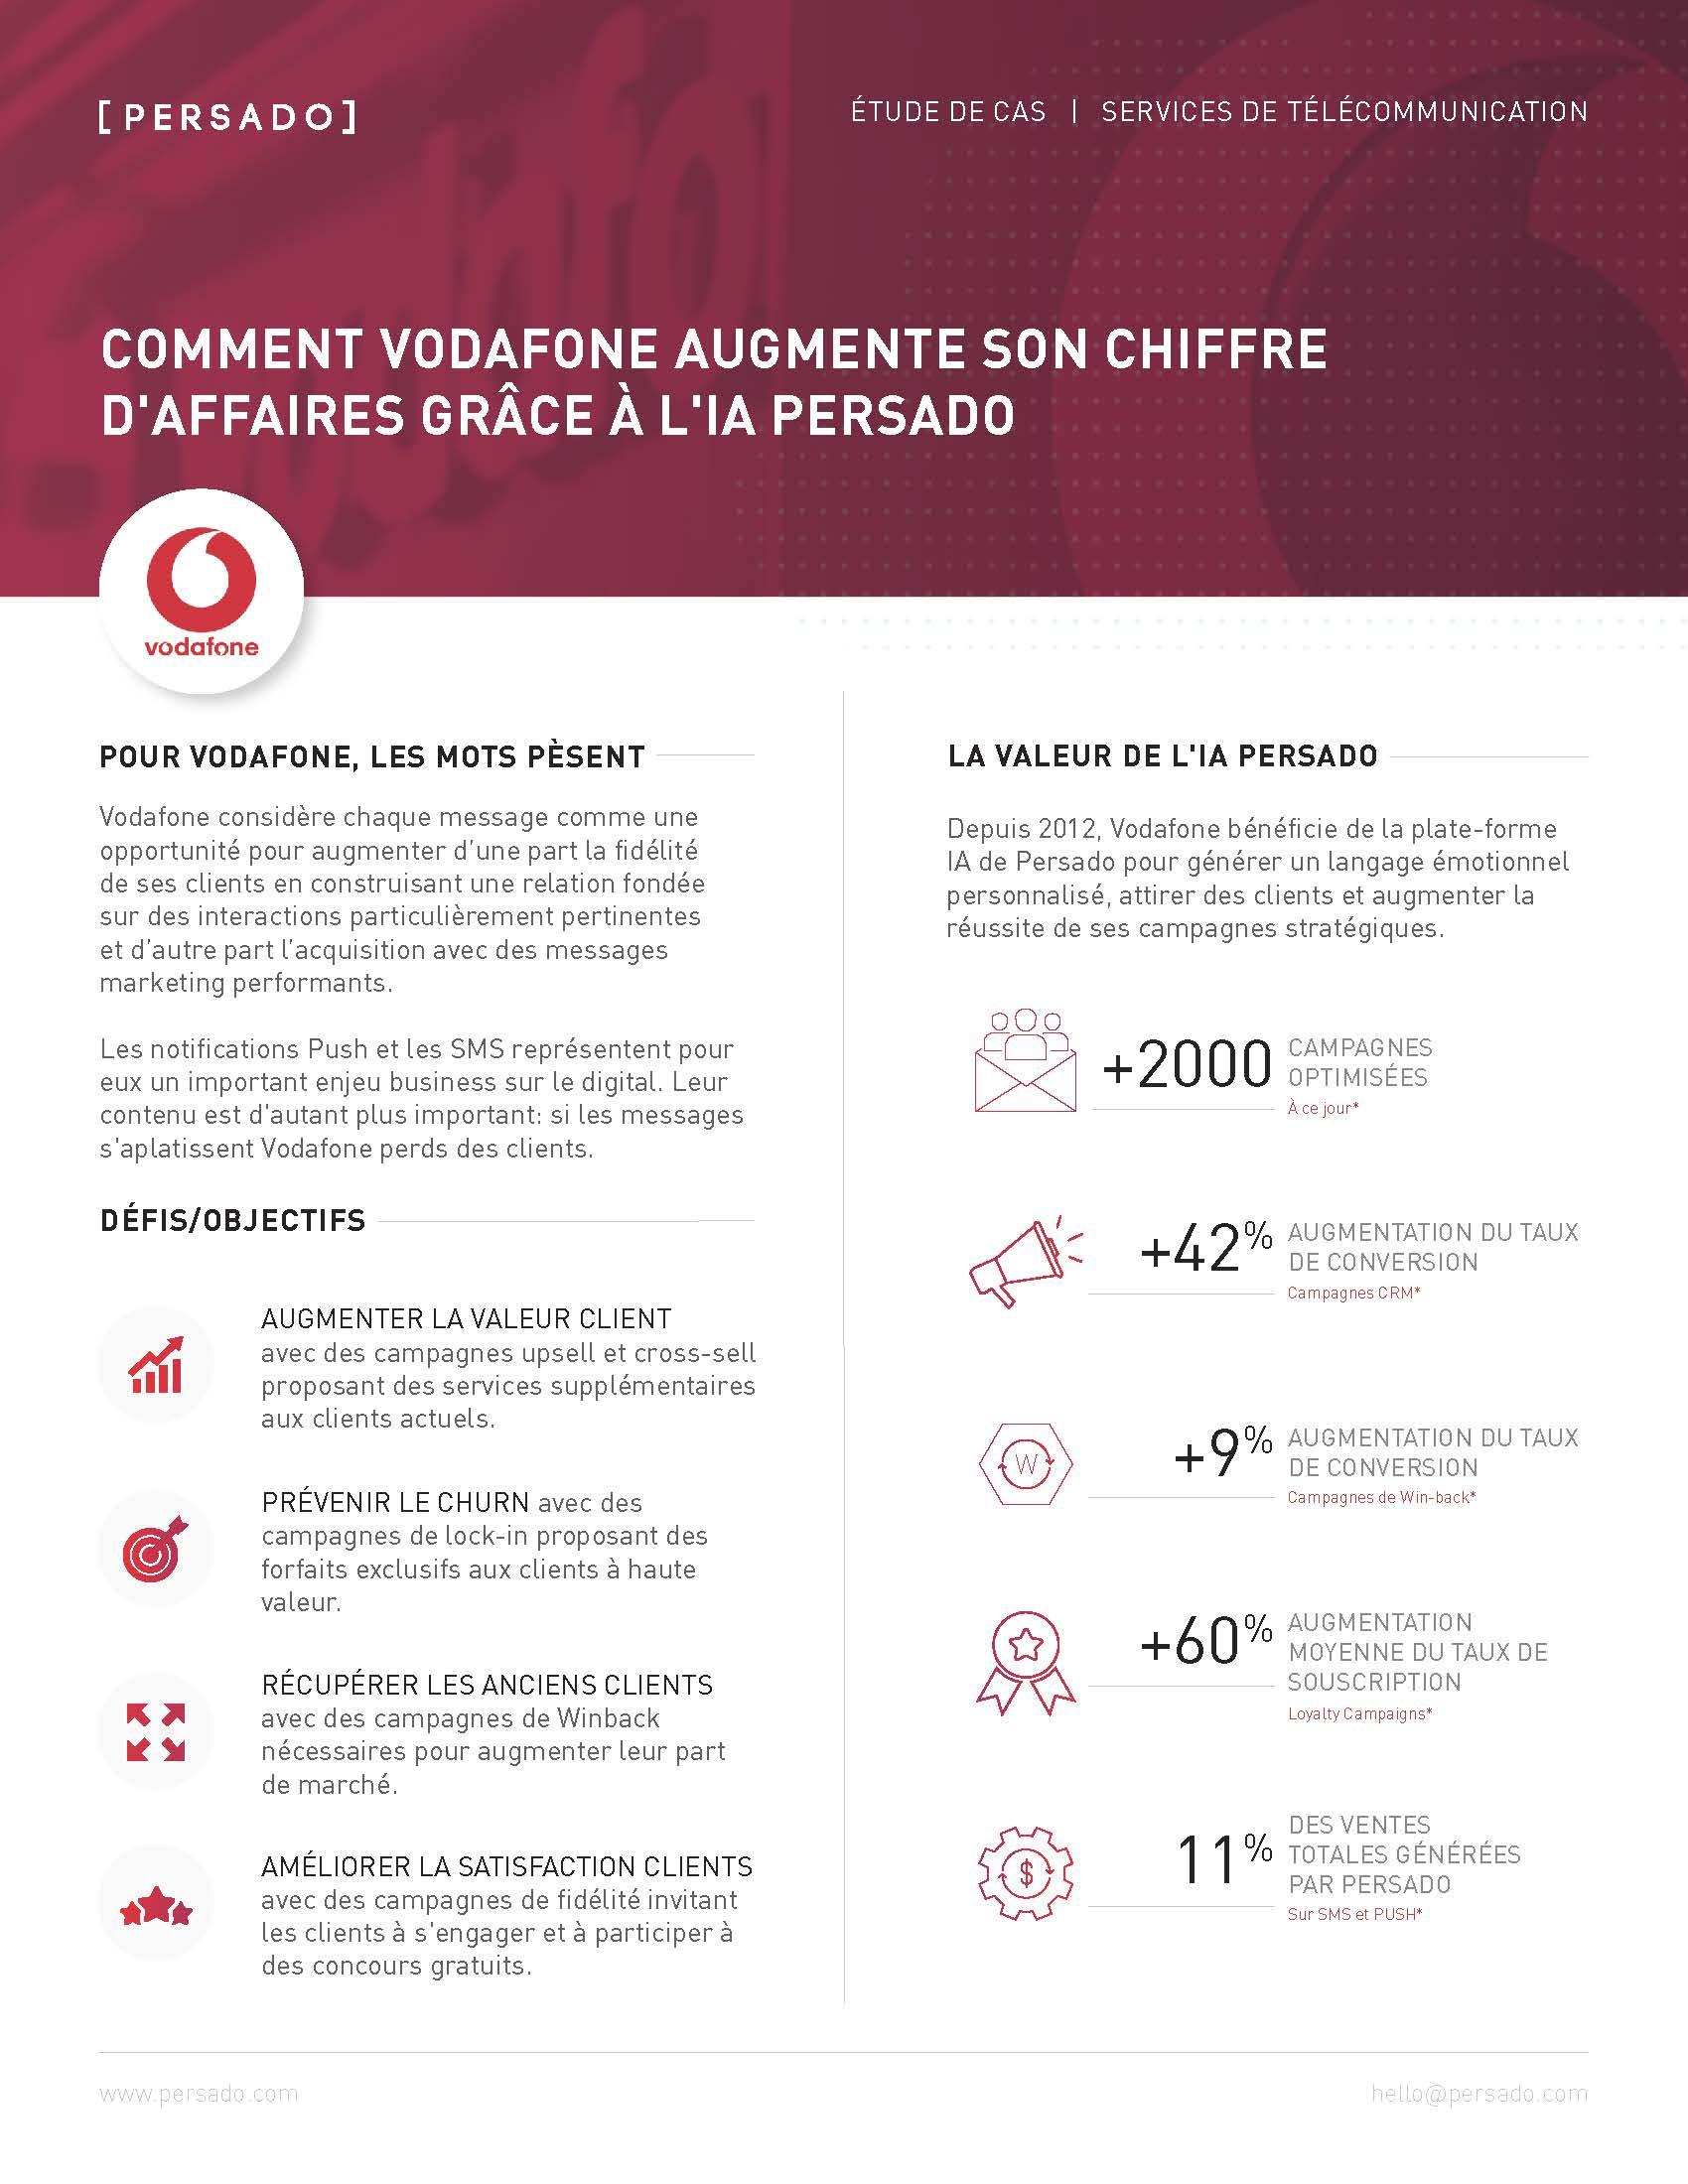 Vodafone francais cs